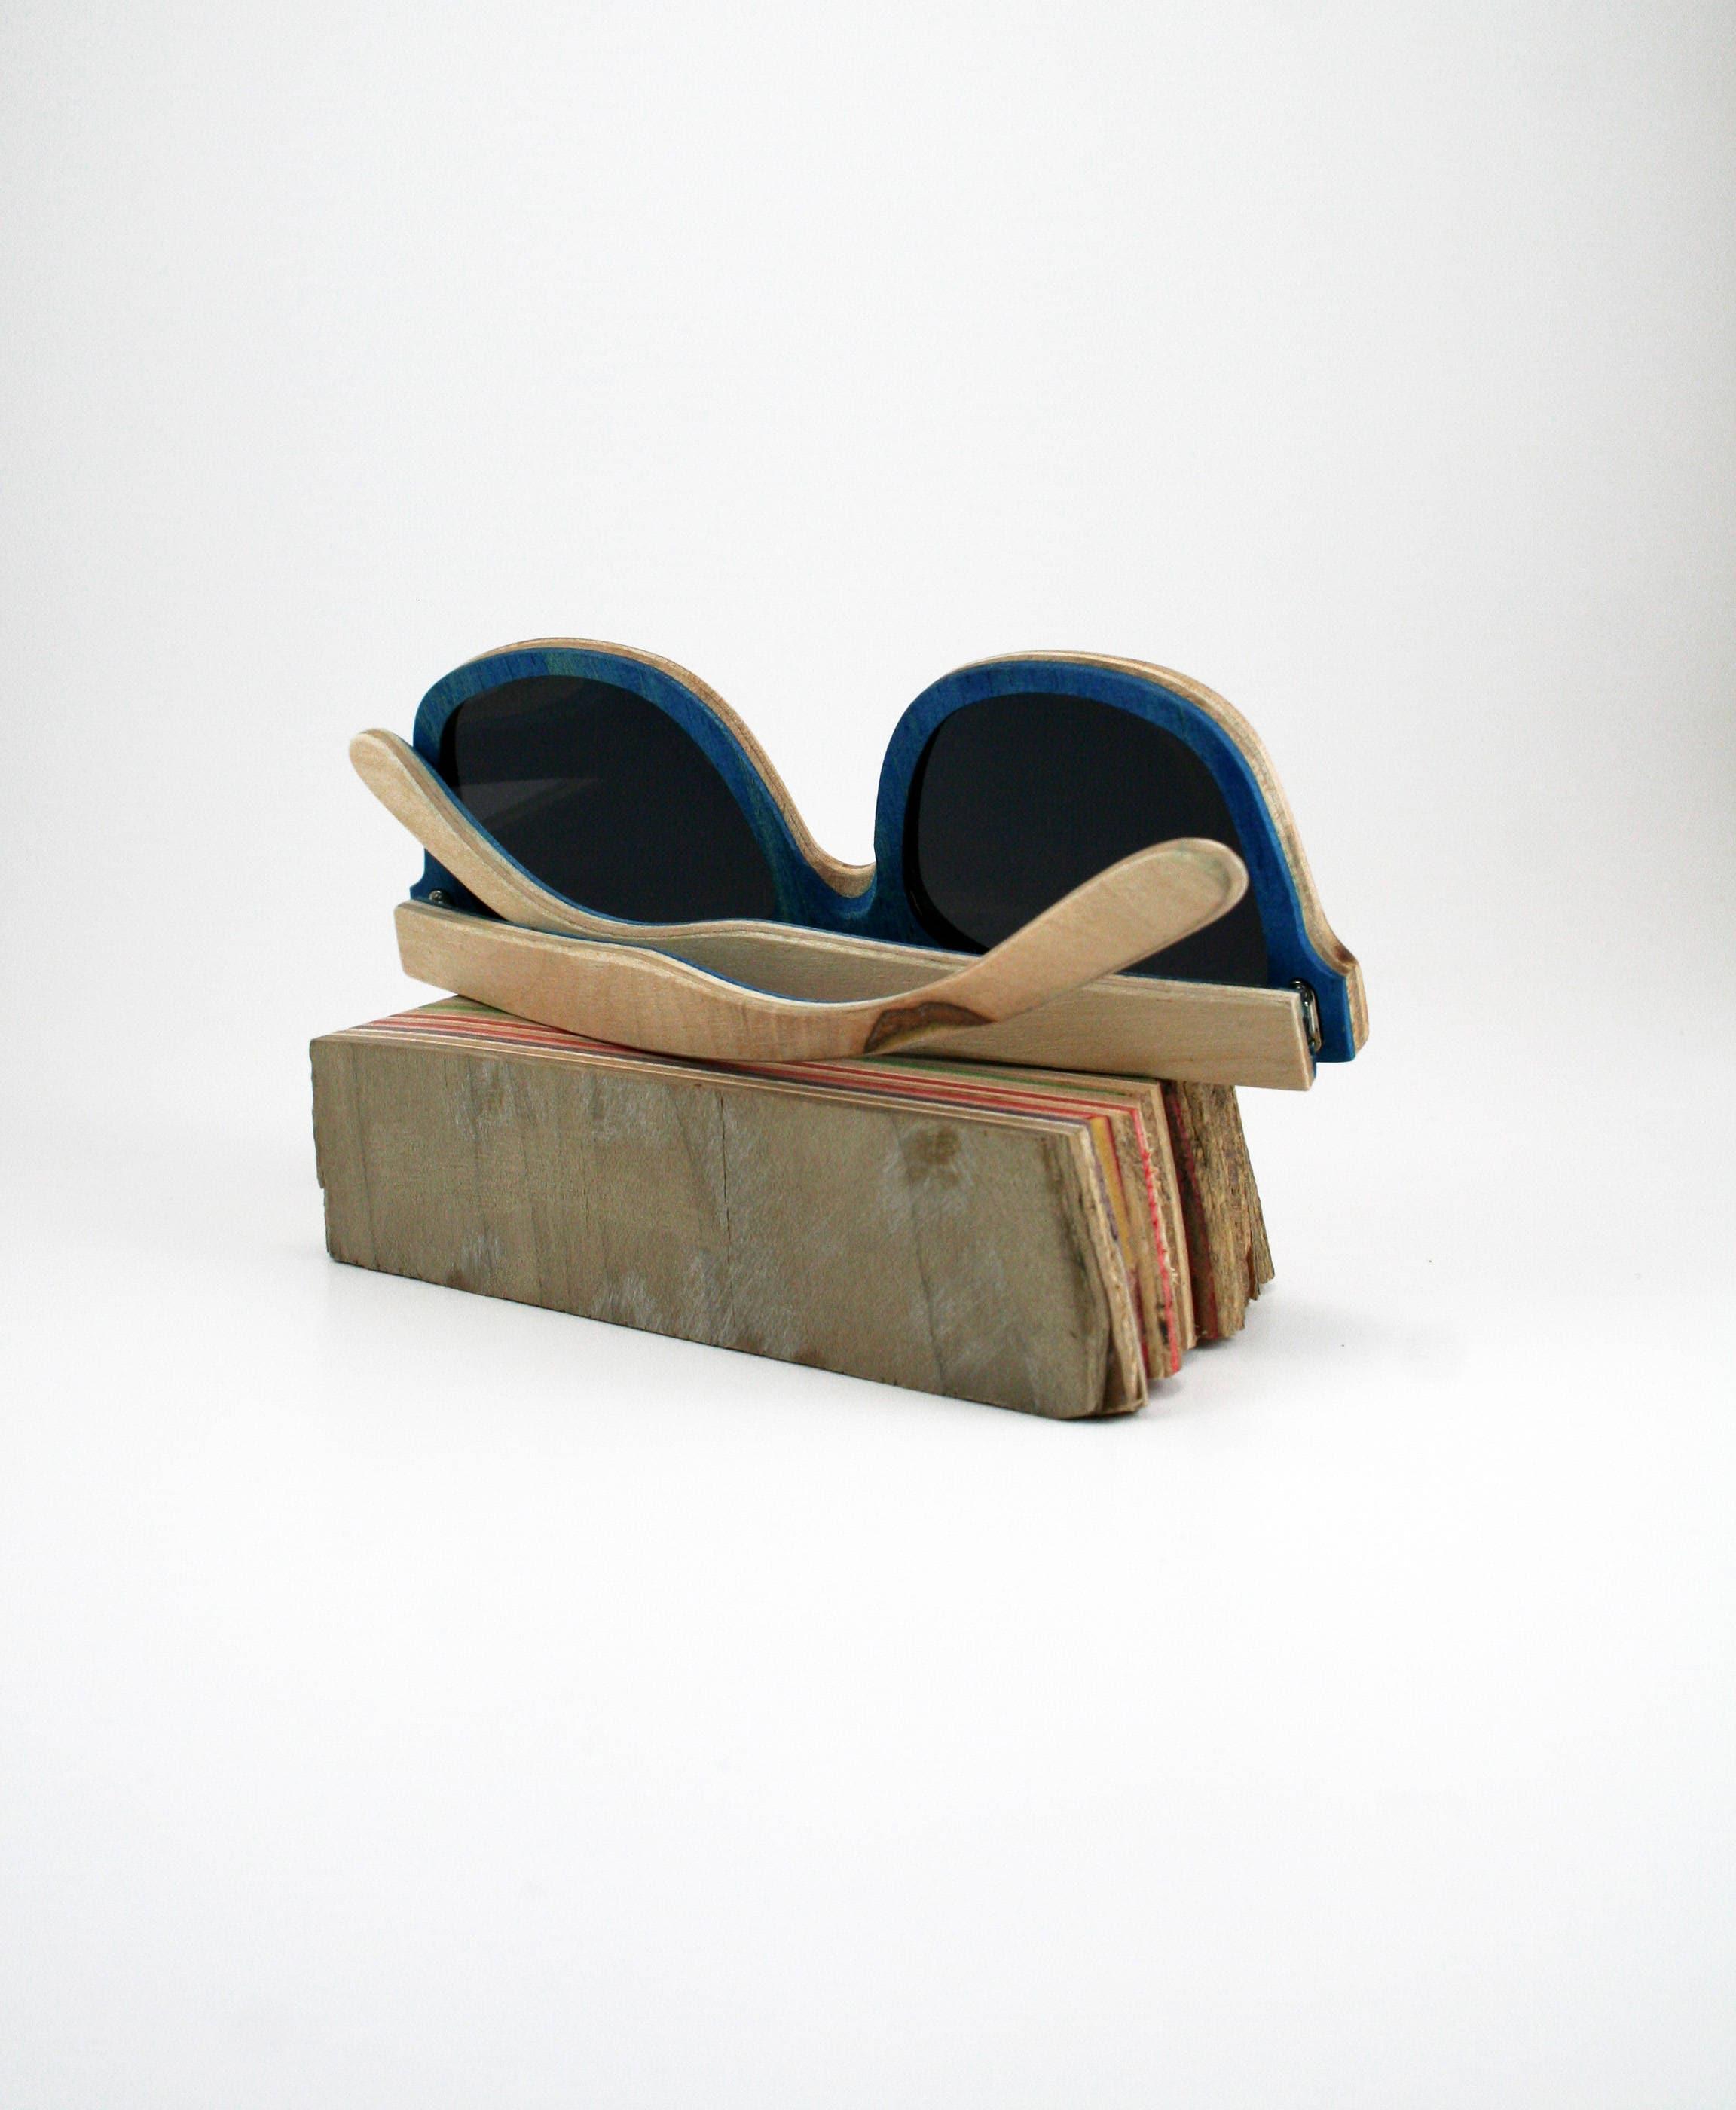 Recycled wooden skateboard sunglasses madeincanada